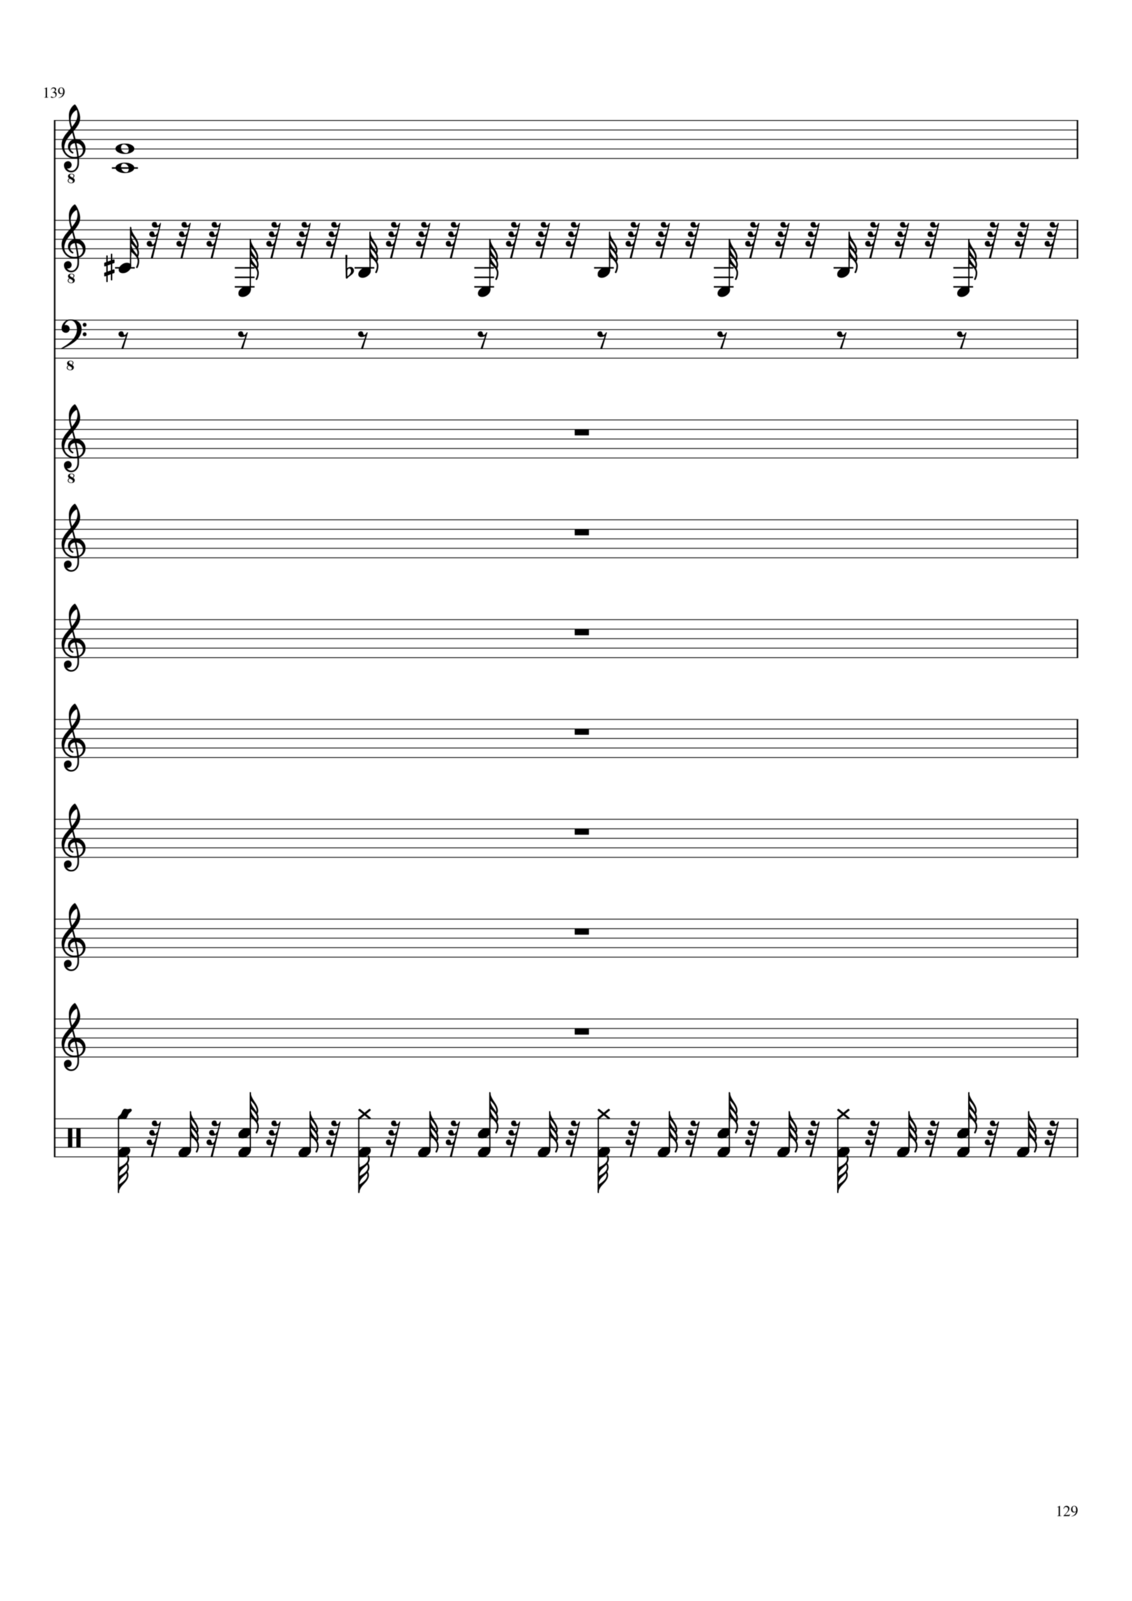 Belyiy sokol slide, Image 129